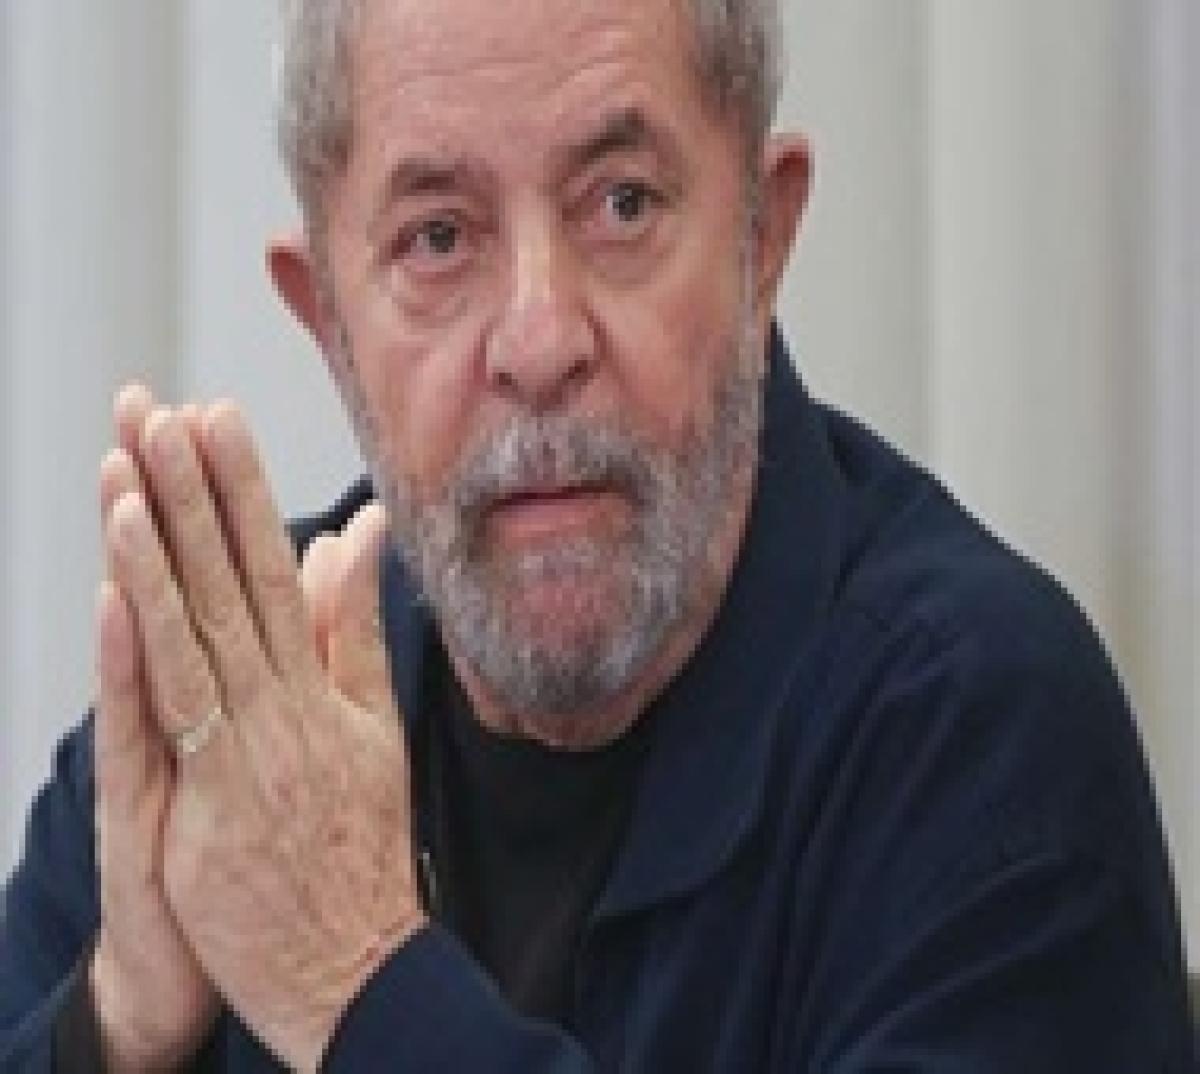 Brazil's ex-president Lula defiant after detention